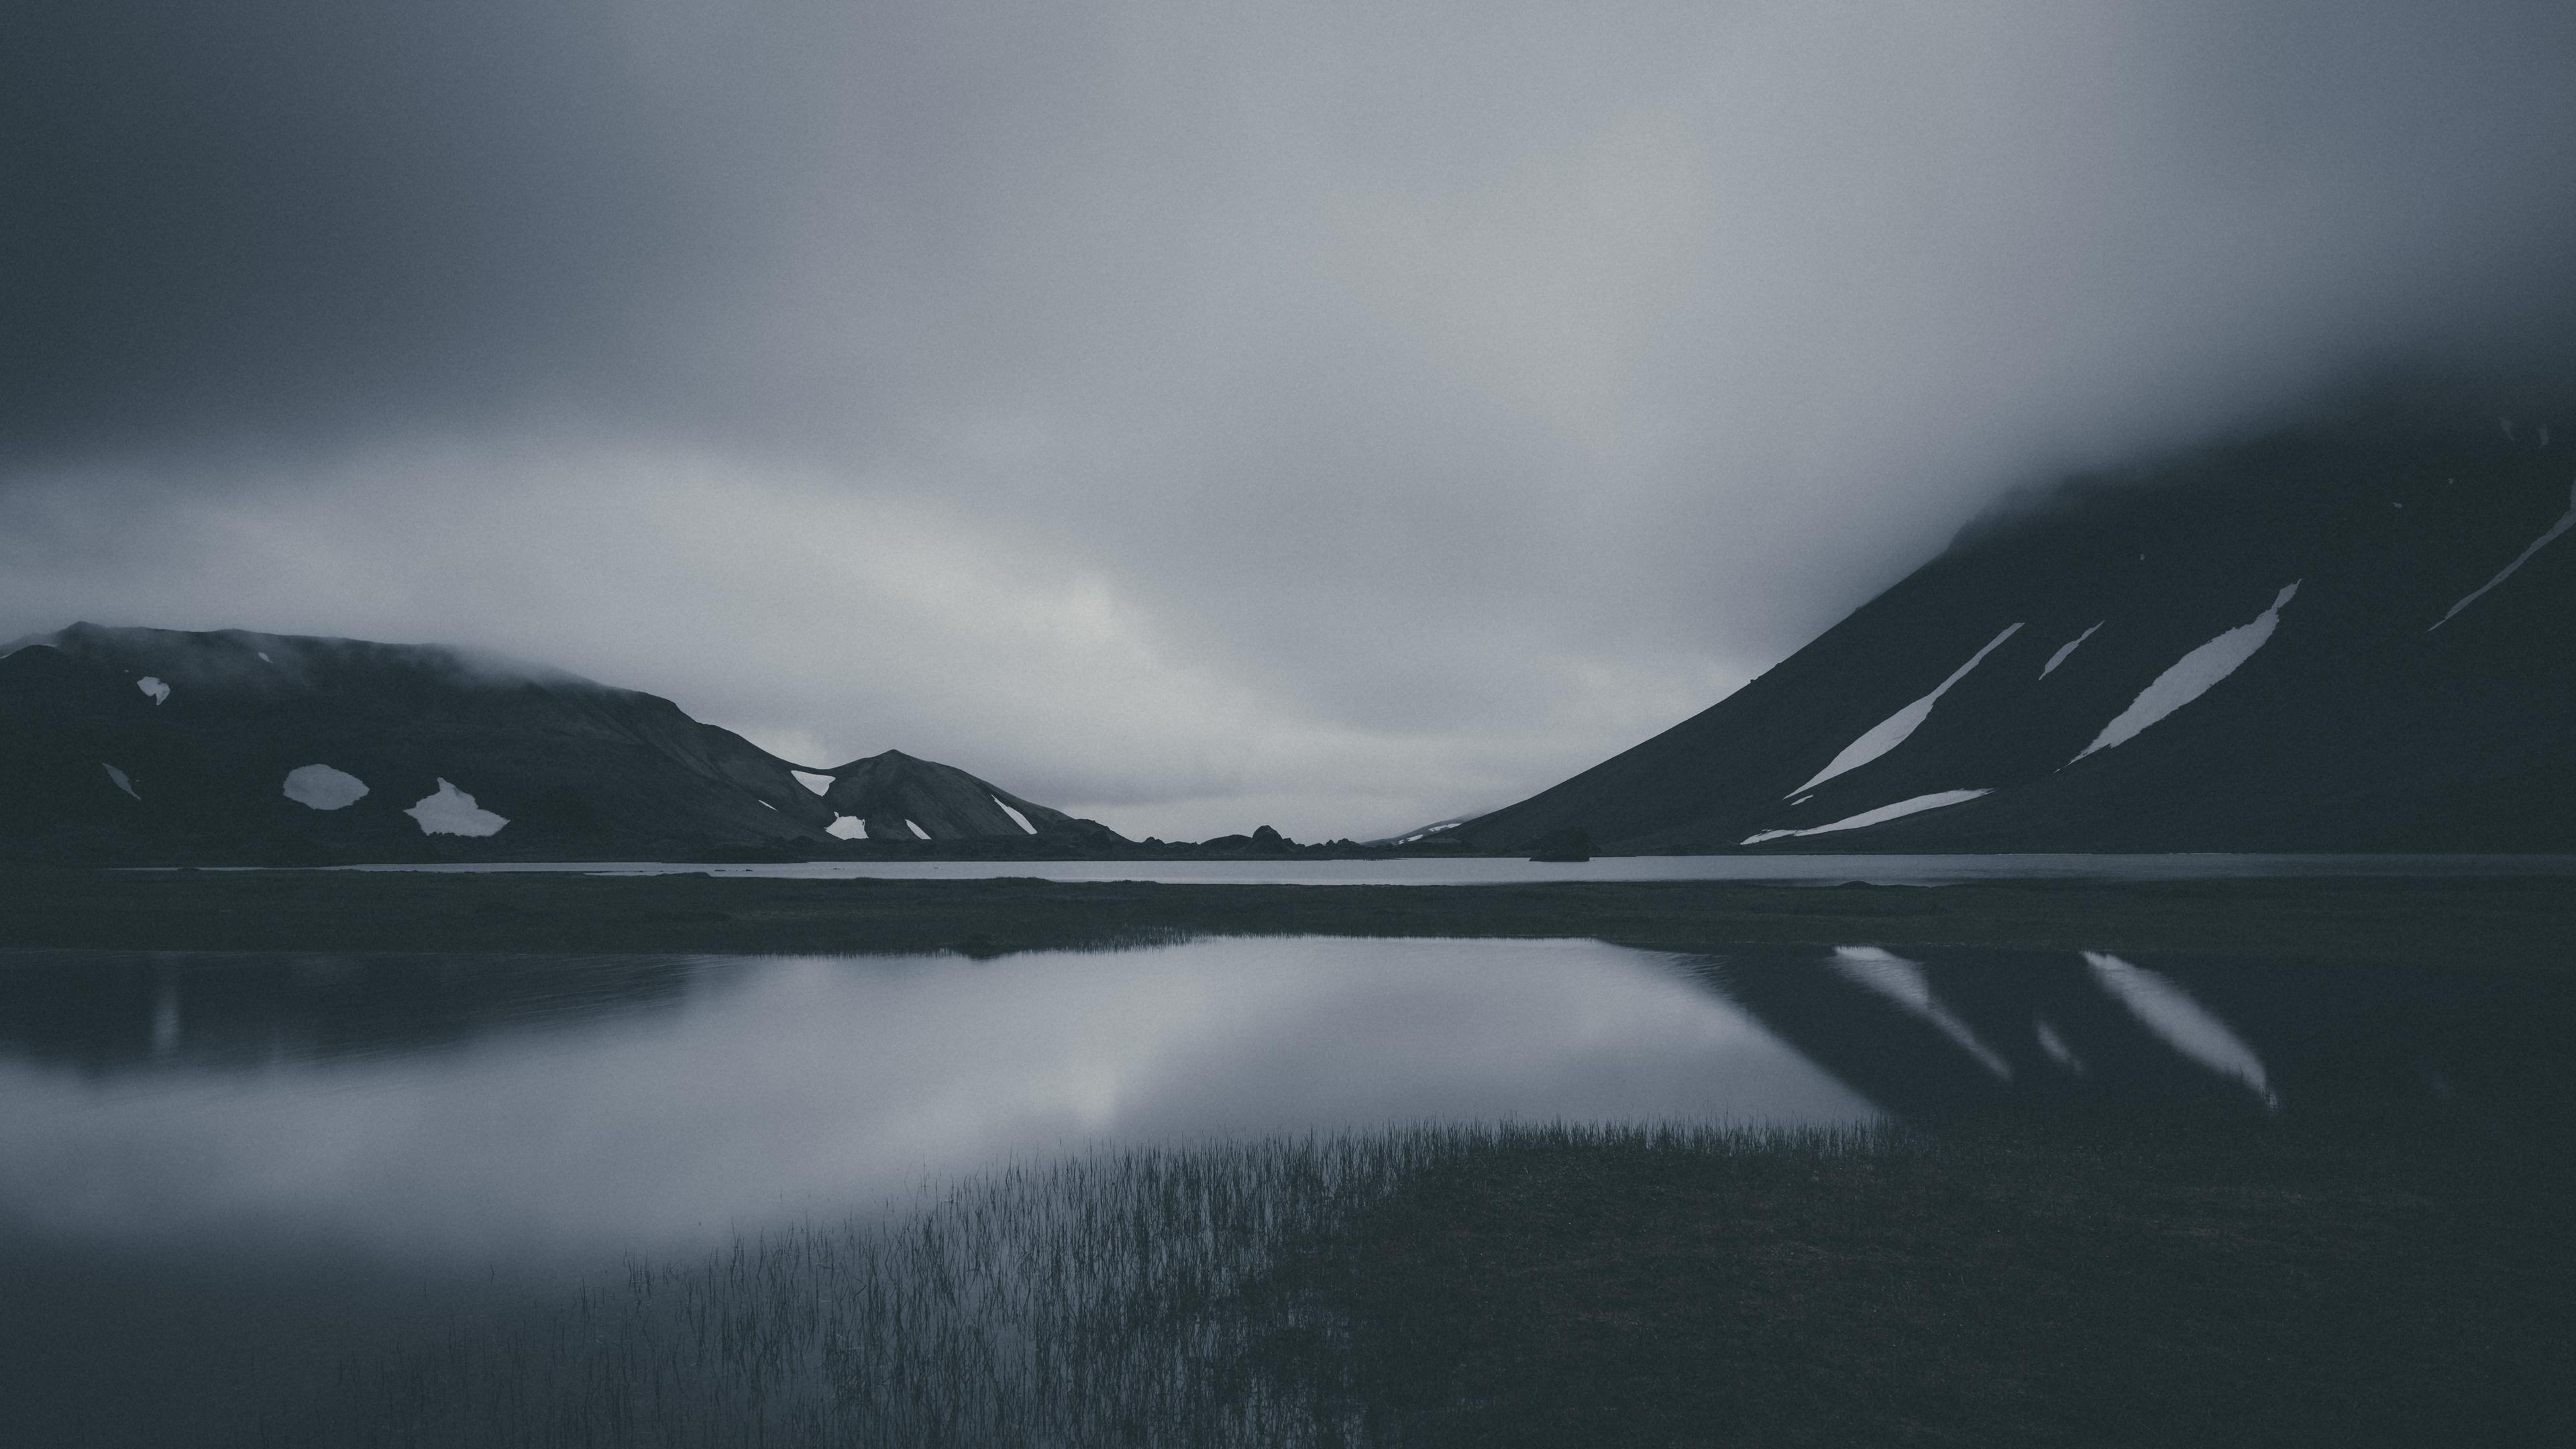 mountain lake dark bw 4k 1540574464 - mountain, lake, dark, bw 4k - Mountain, Lake, Dark